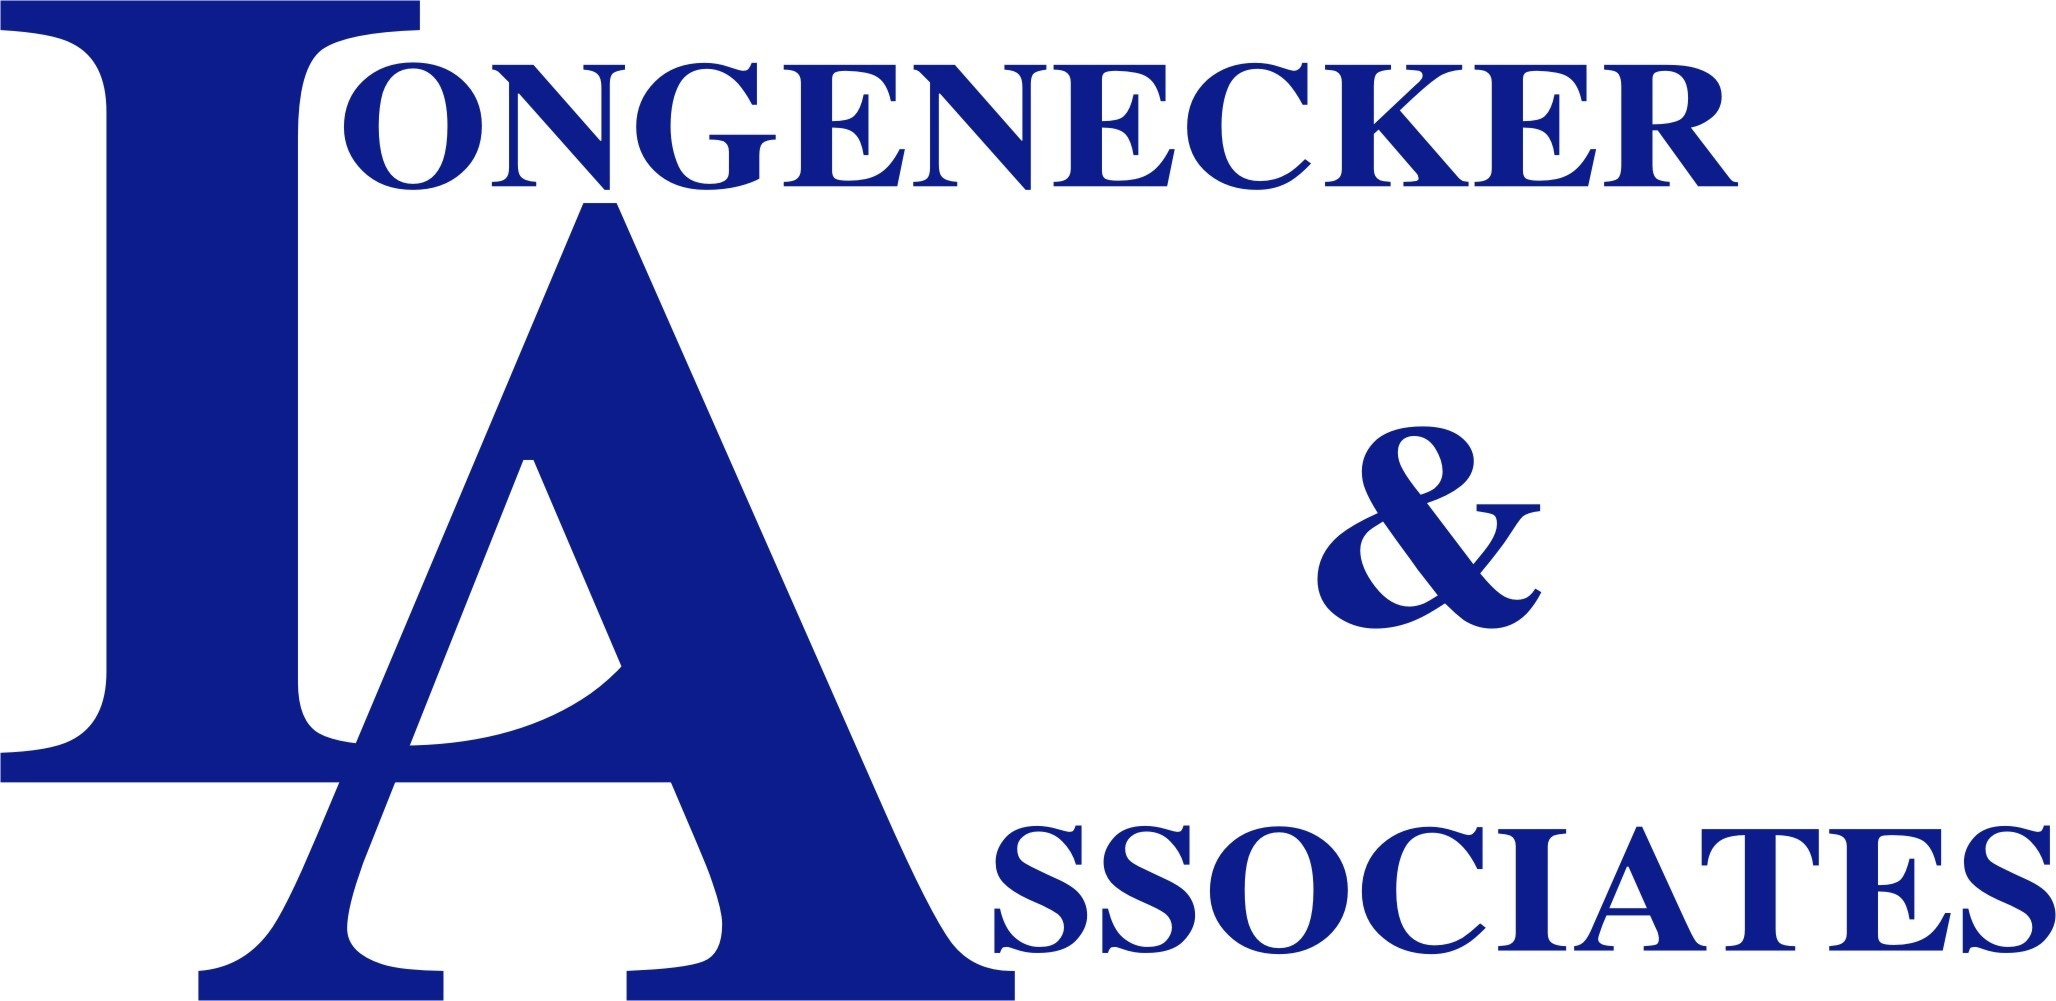 longenecker&associates